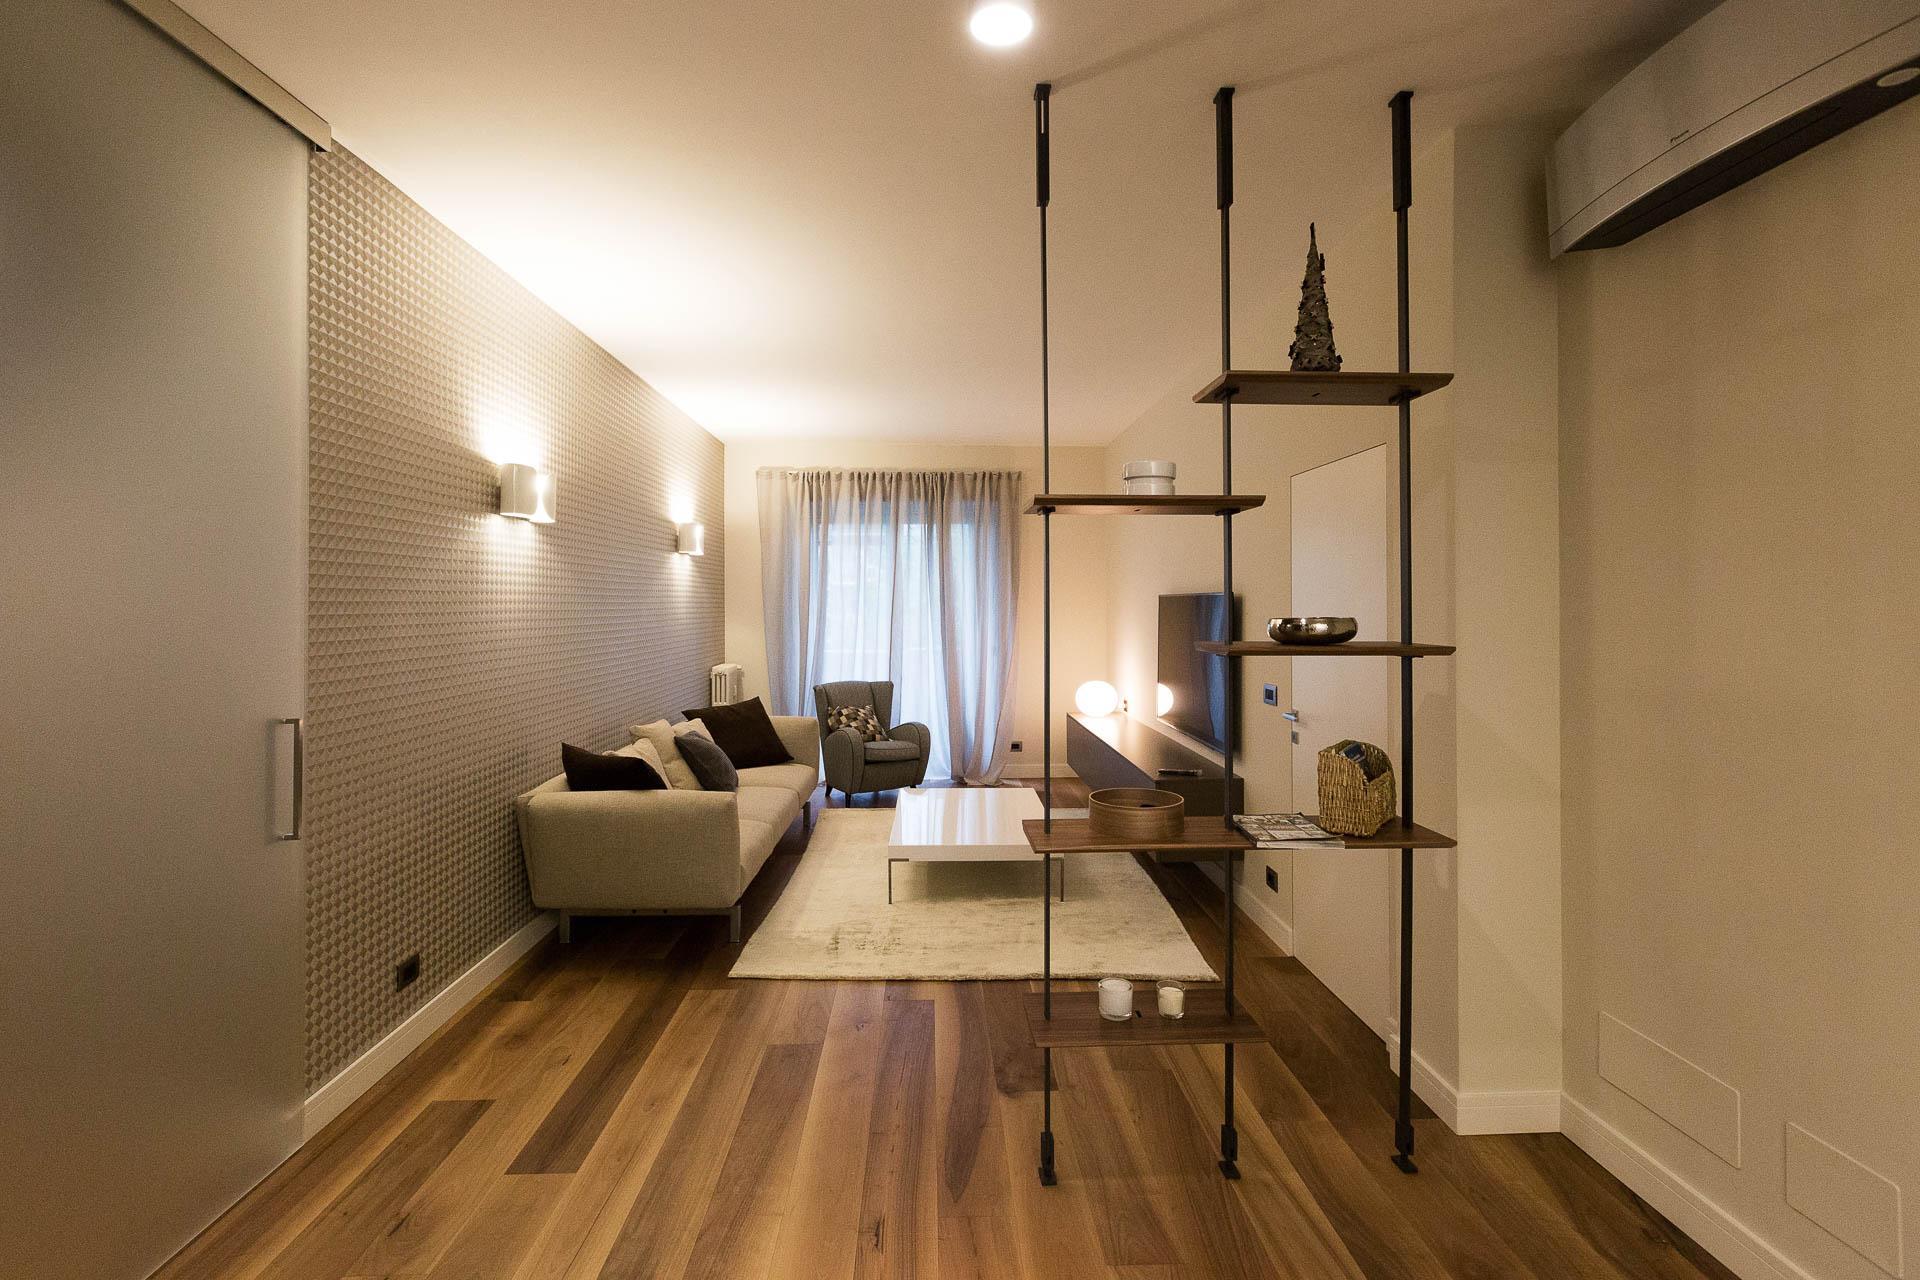 Glen_impresa edile_Appartamento 2_Simpol_00013